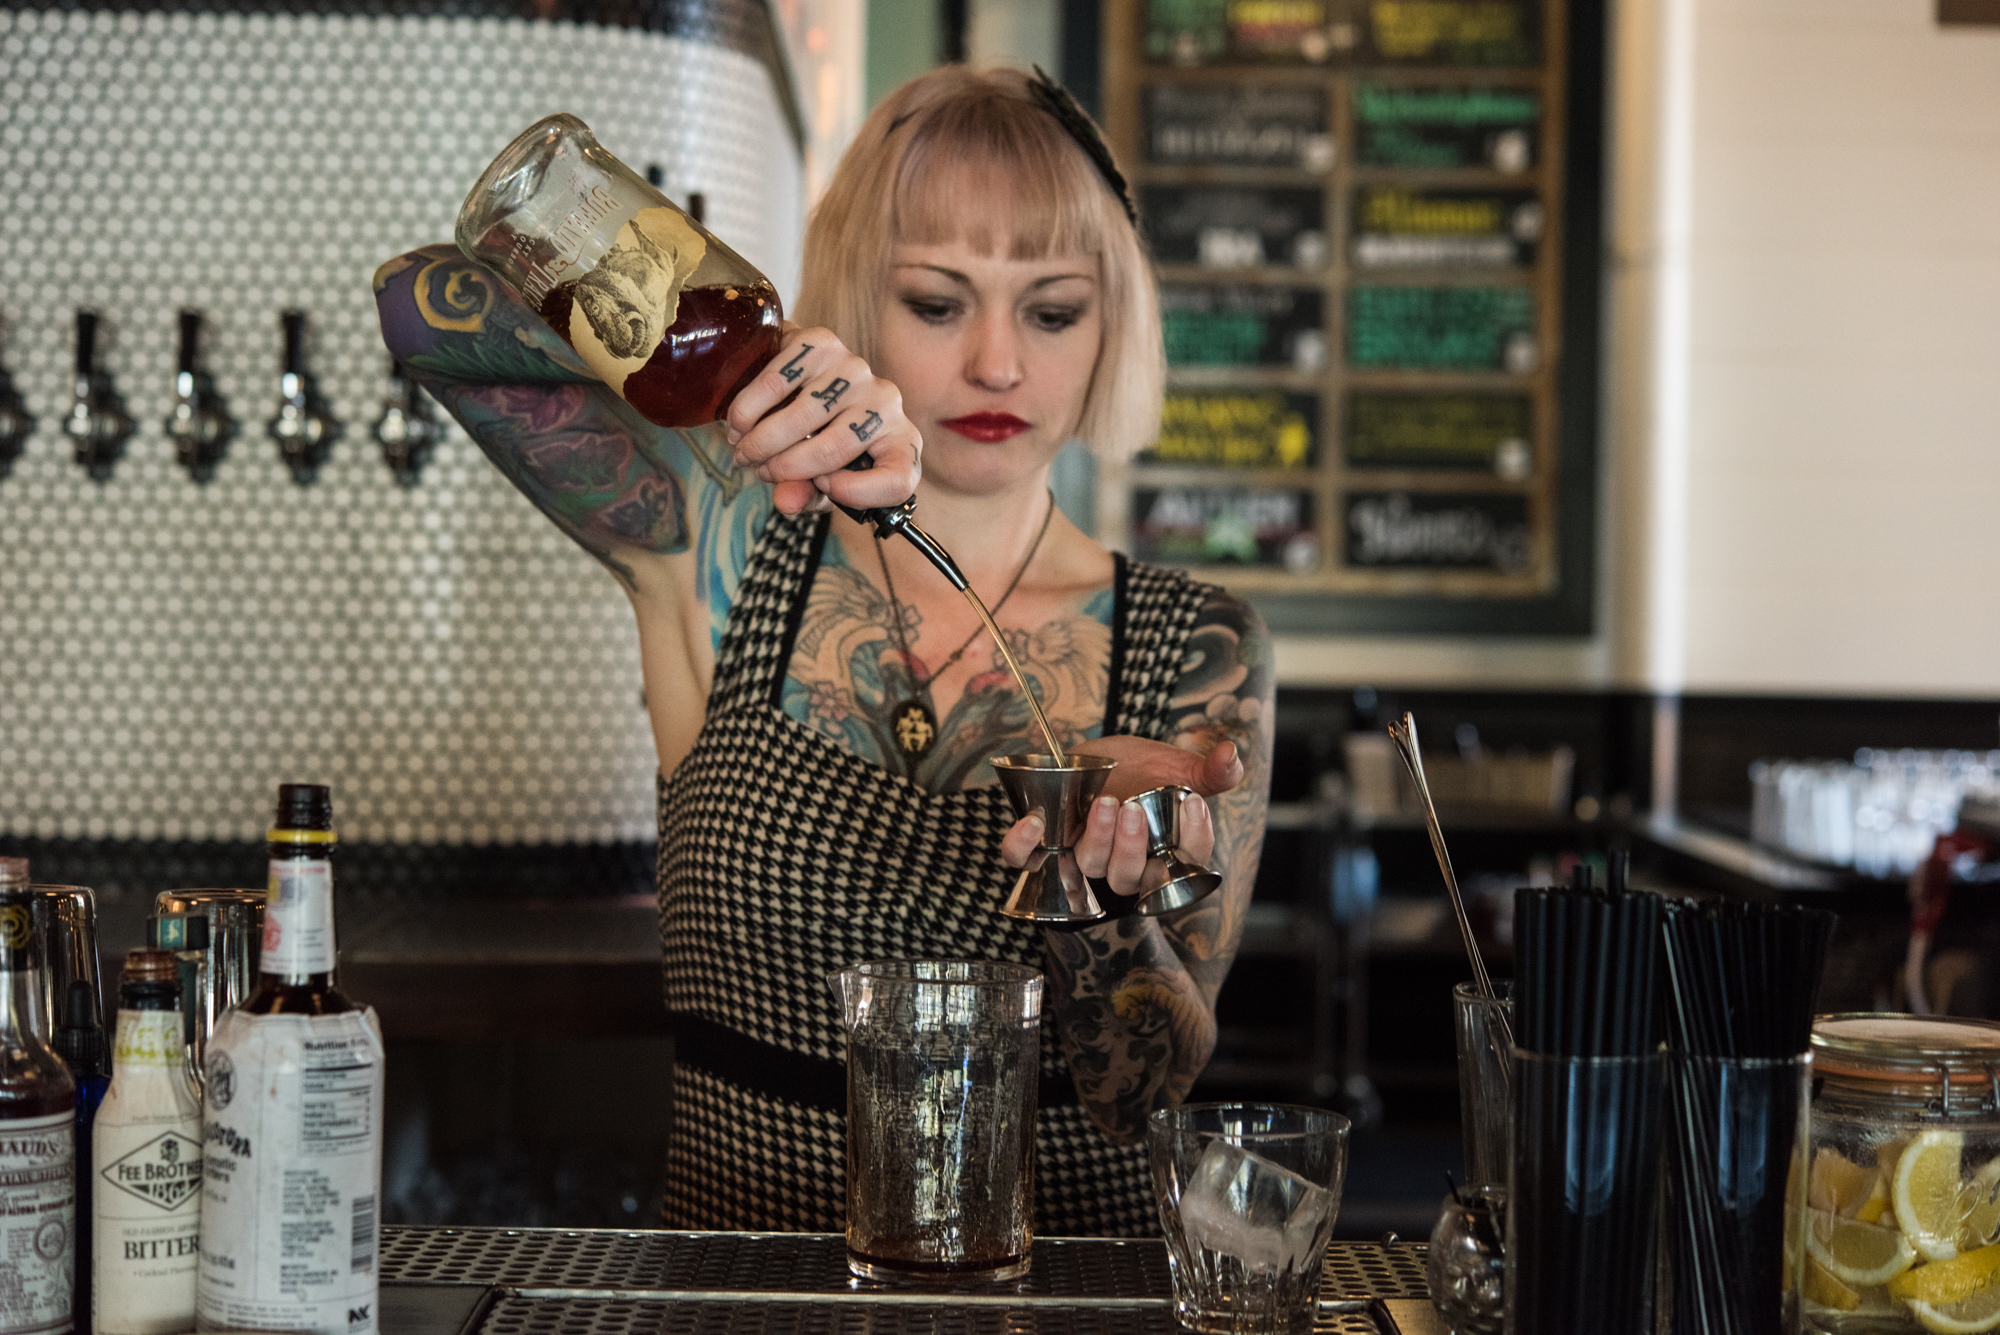 Victoria Bar head bartender Lisa Victoria Hare